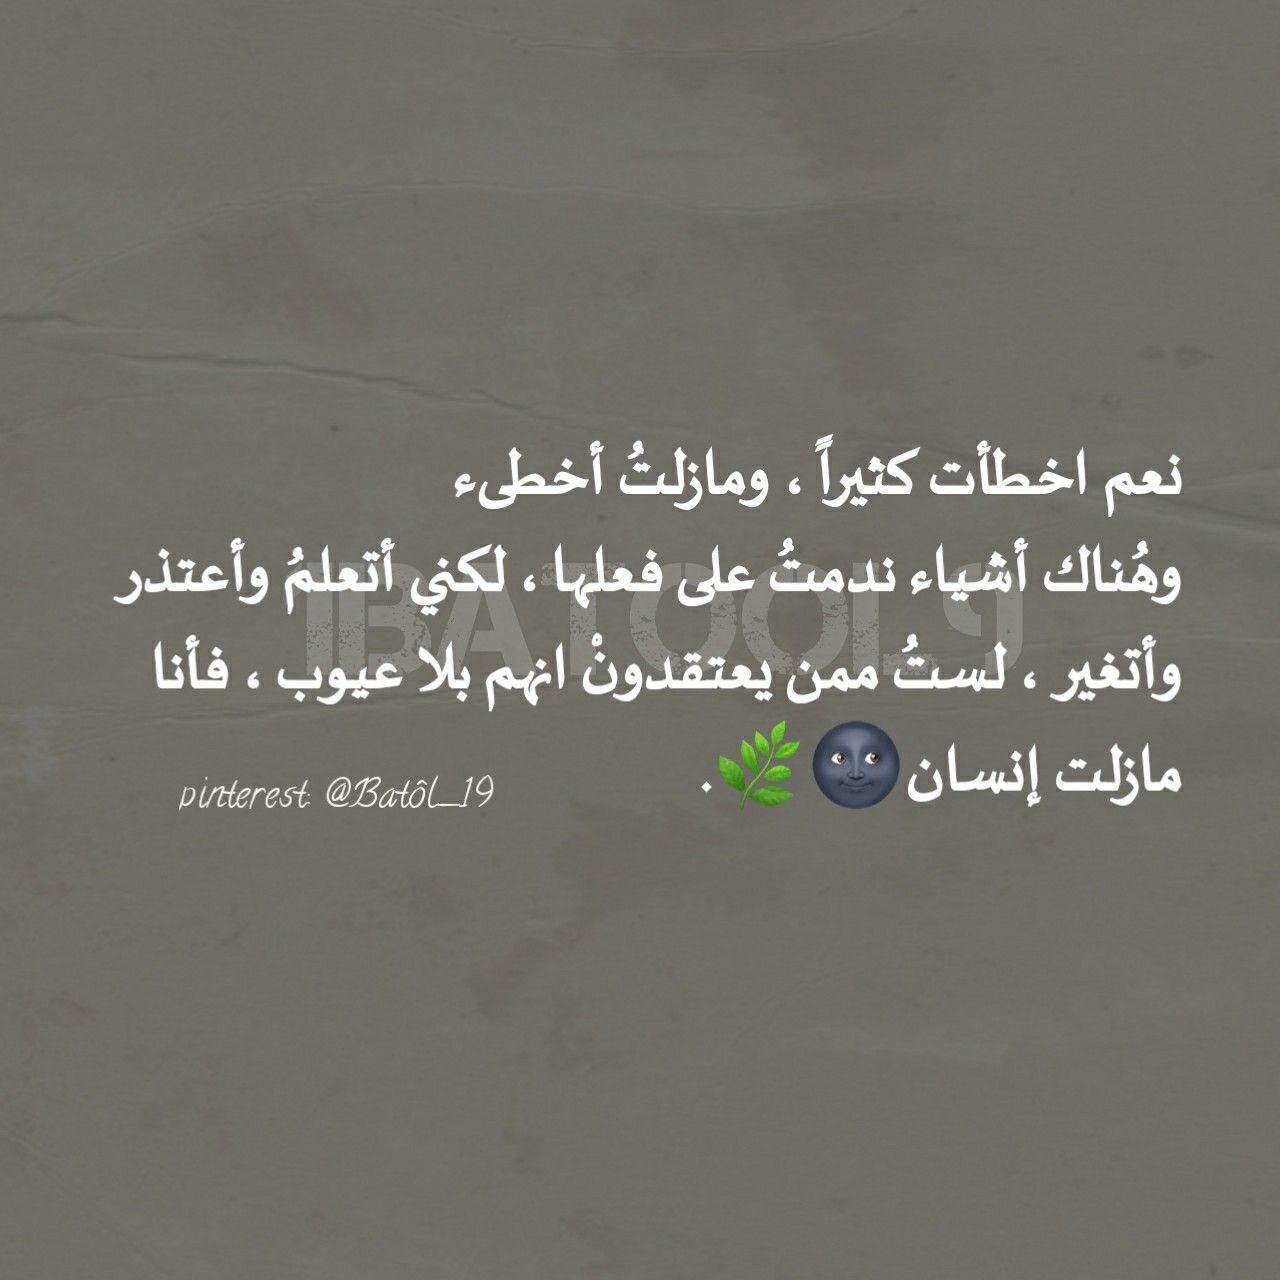 نــ ــم اخطأت ڪثيرا الله حب وطن العراق اقتباسات رمزيات تصاميم كتابات فضفضة شعر ستوريات Islamic Love Quotes Quotes Love Quotes